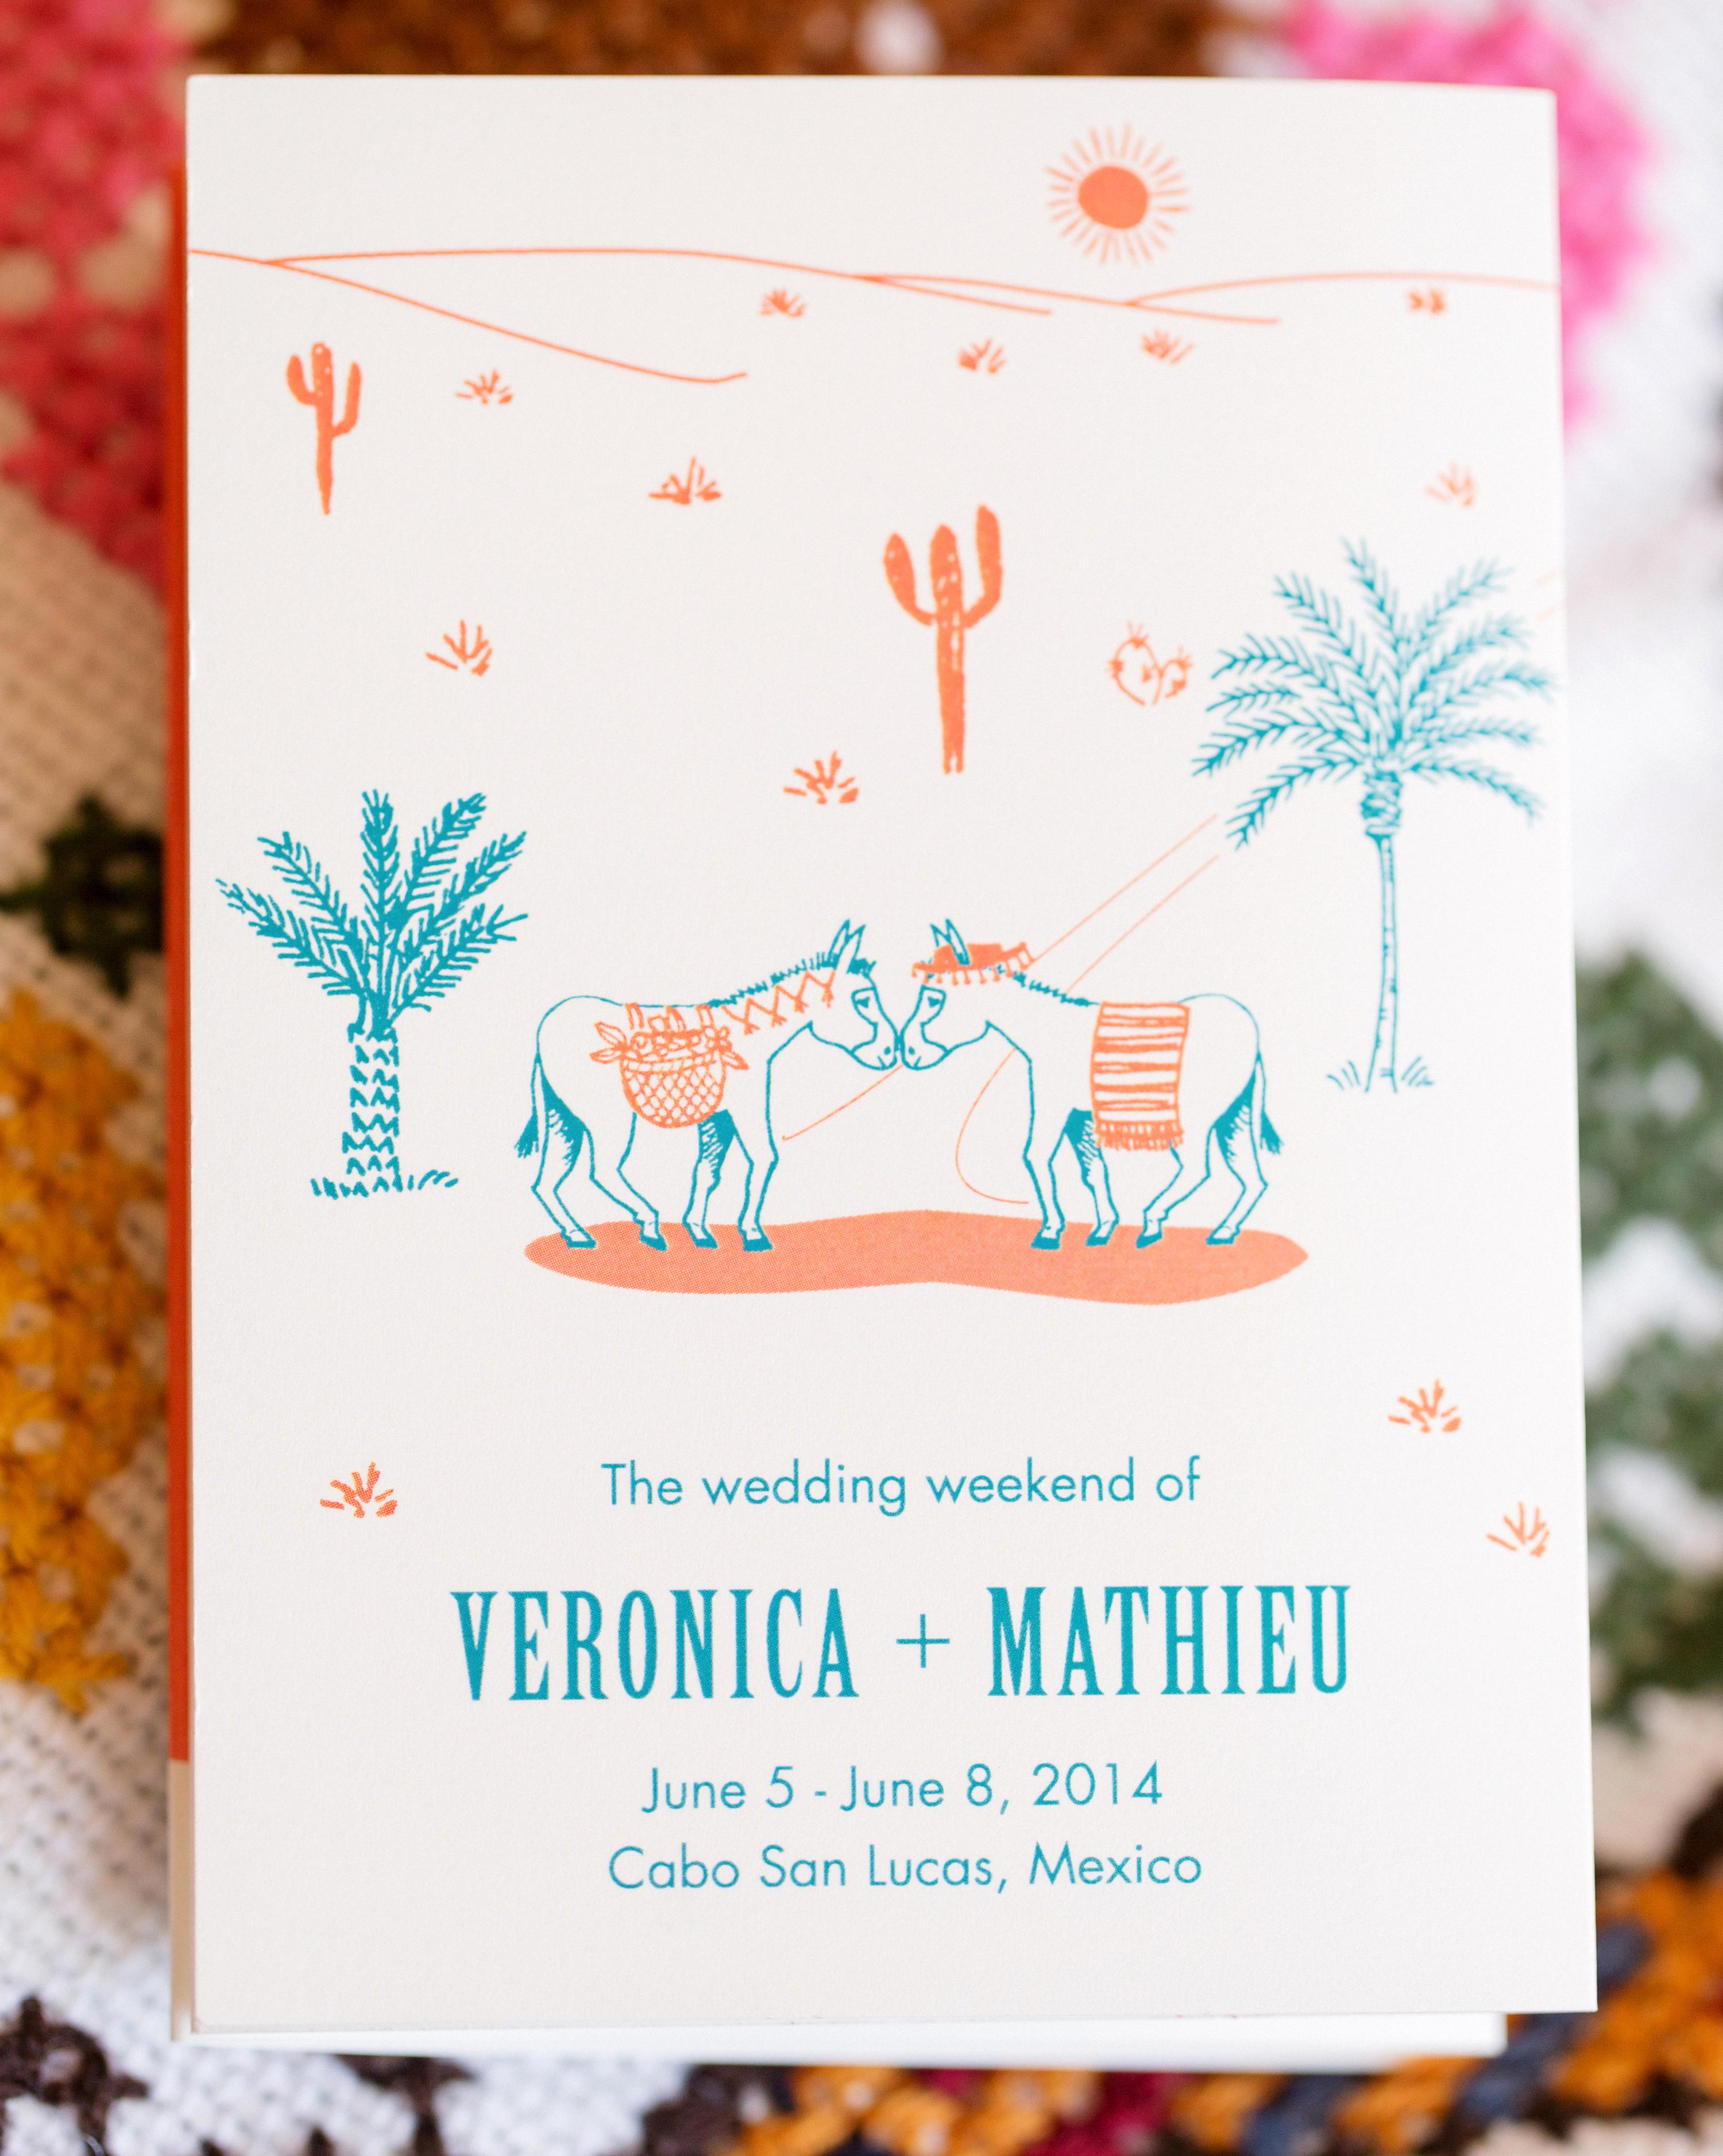 veronica-mathieu-wedding-invite-0626-s111501-1014.jpg